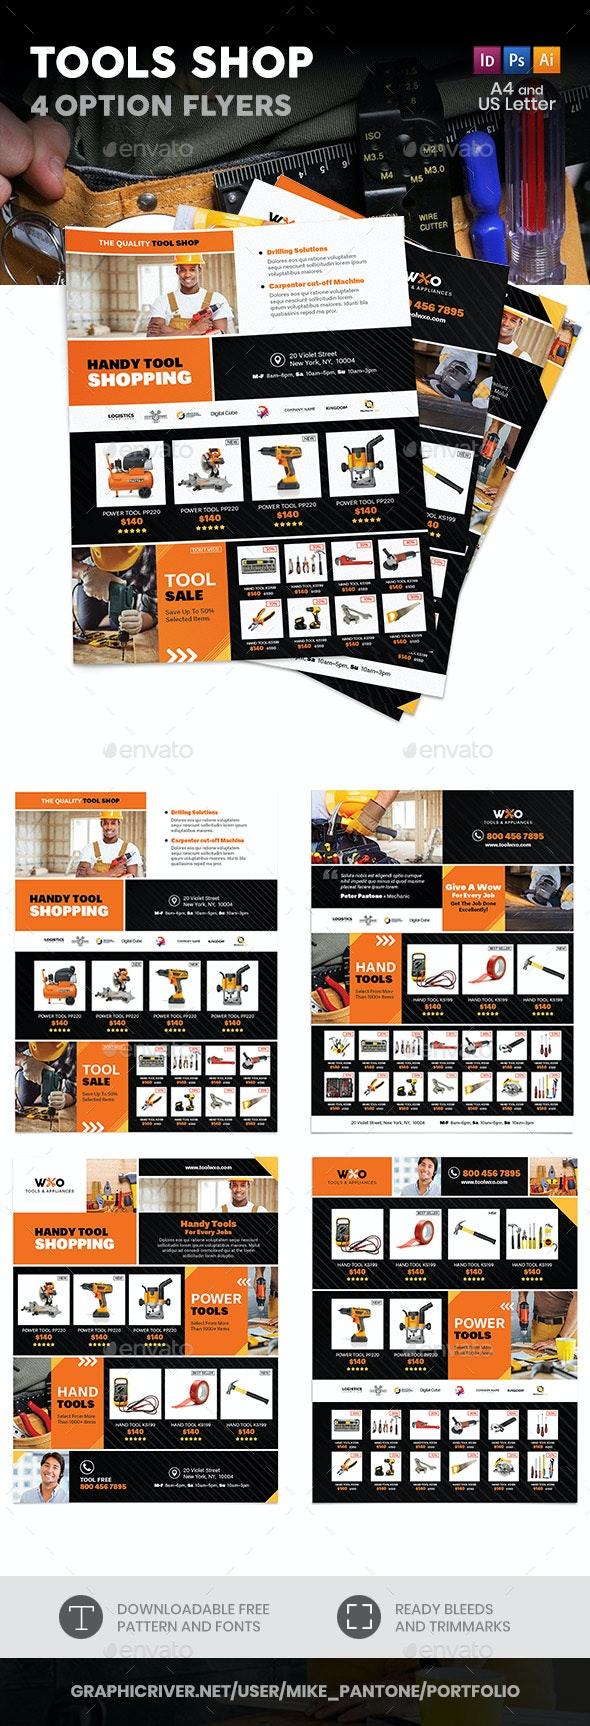 Tools Shop Flyers – 4 Options - Commerce Flyers